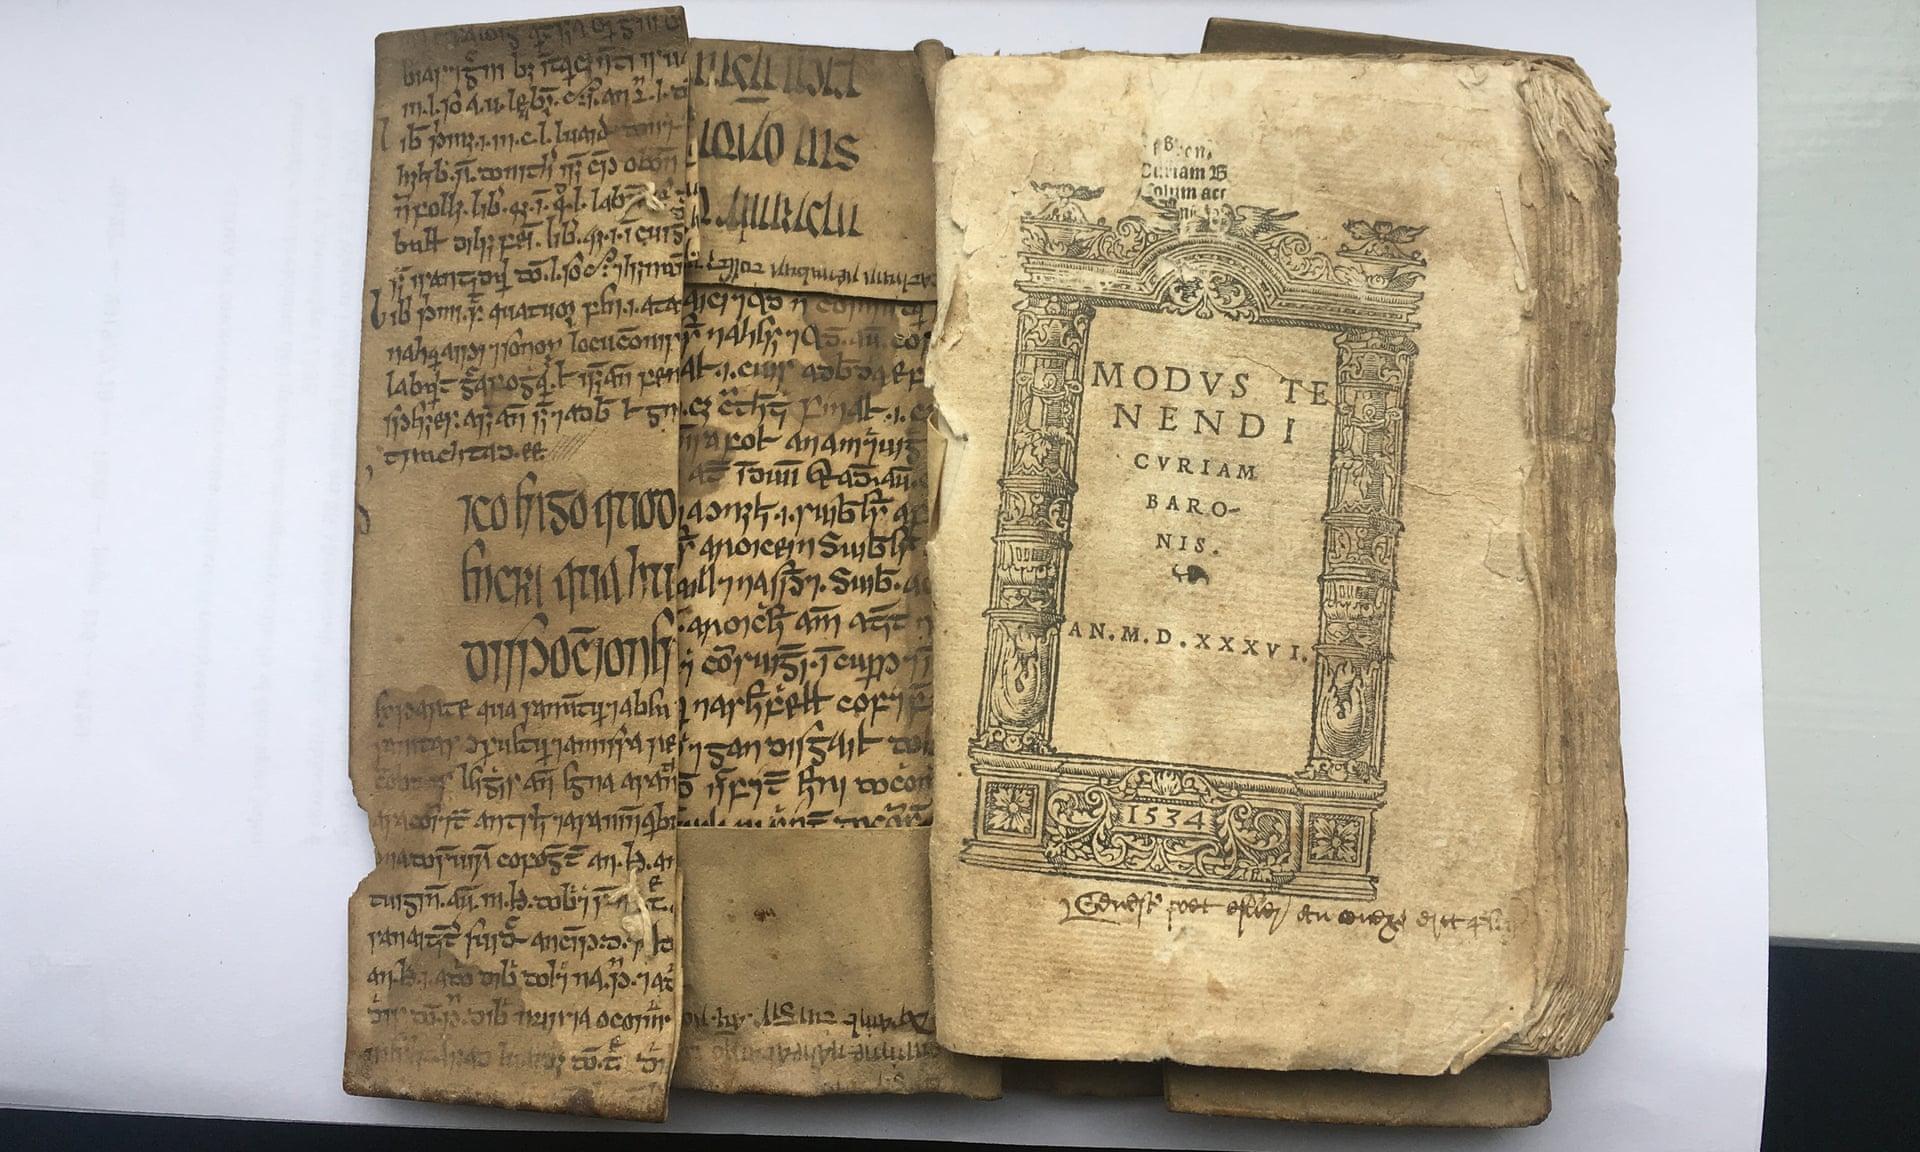 Unknown Irish translation of Ibn Sīna medical text discovered in ancient book - Naya Daur